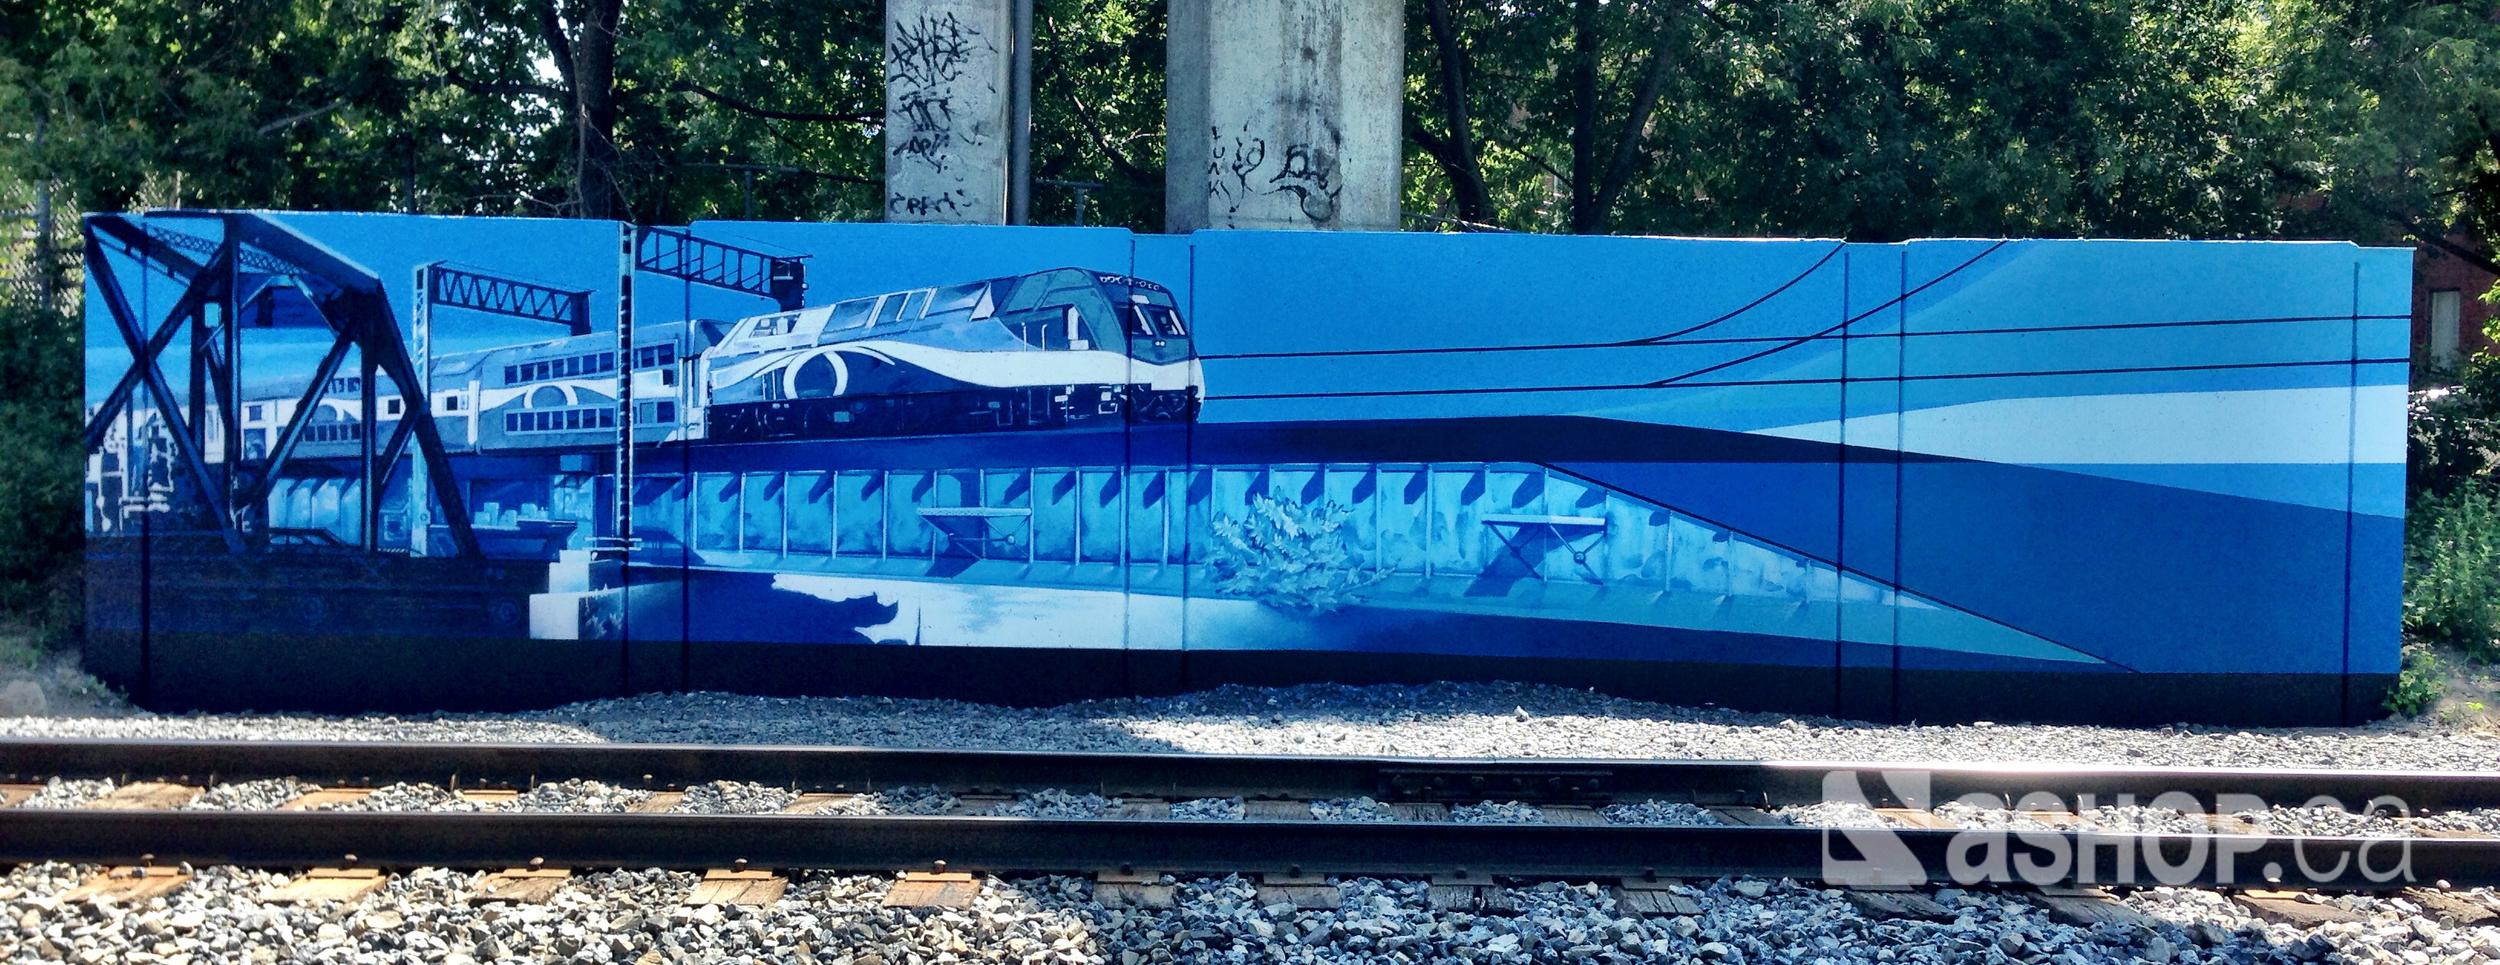 ashop-a'shop-graffiti-mural-street-art-urban-zek-zeko-zeck-AMT-griffintown-train-tracks-turnbridge.JPG